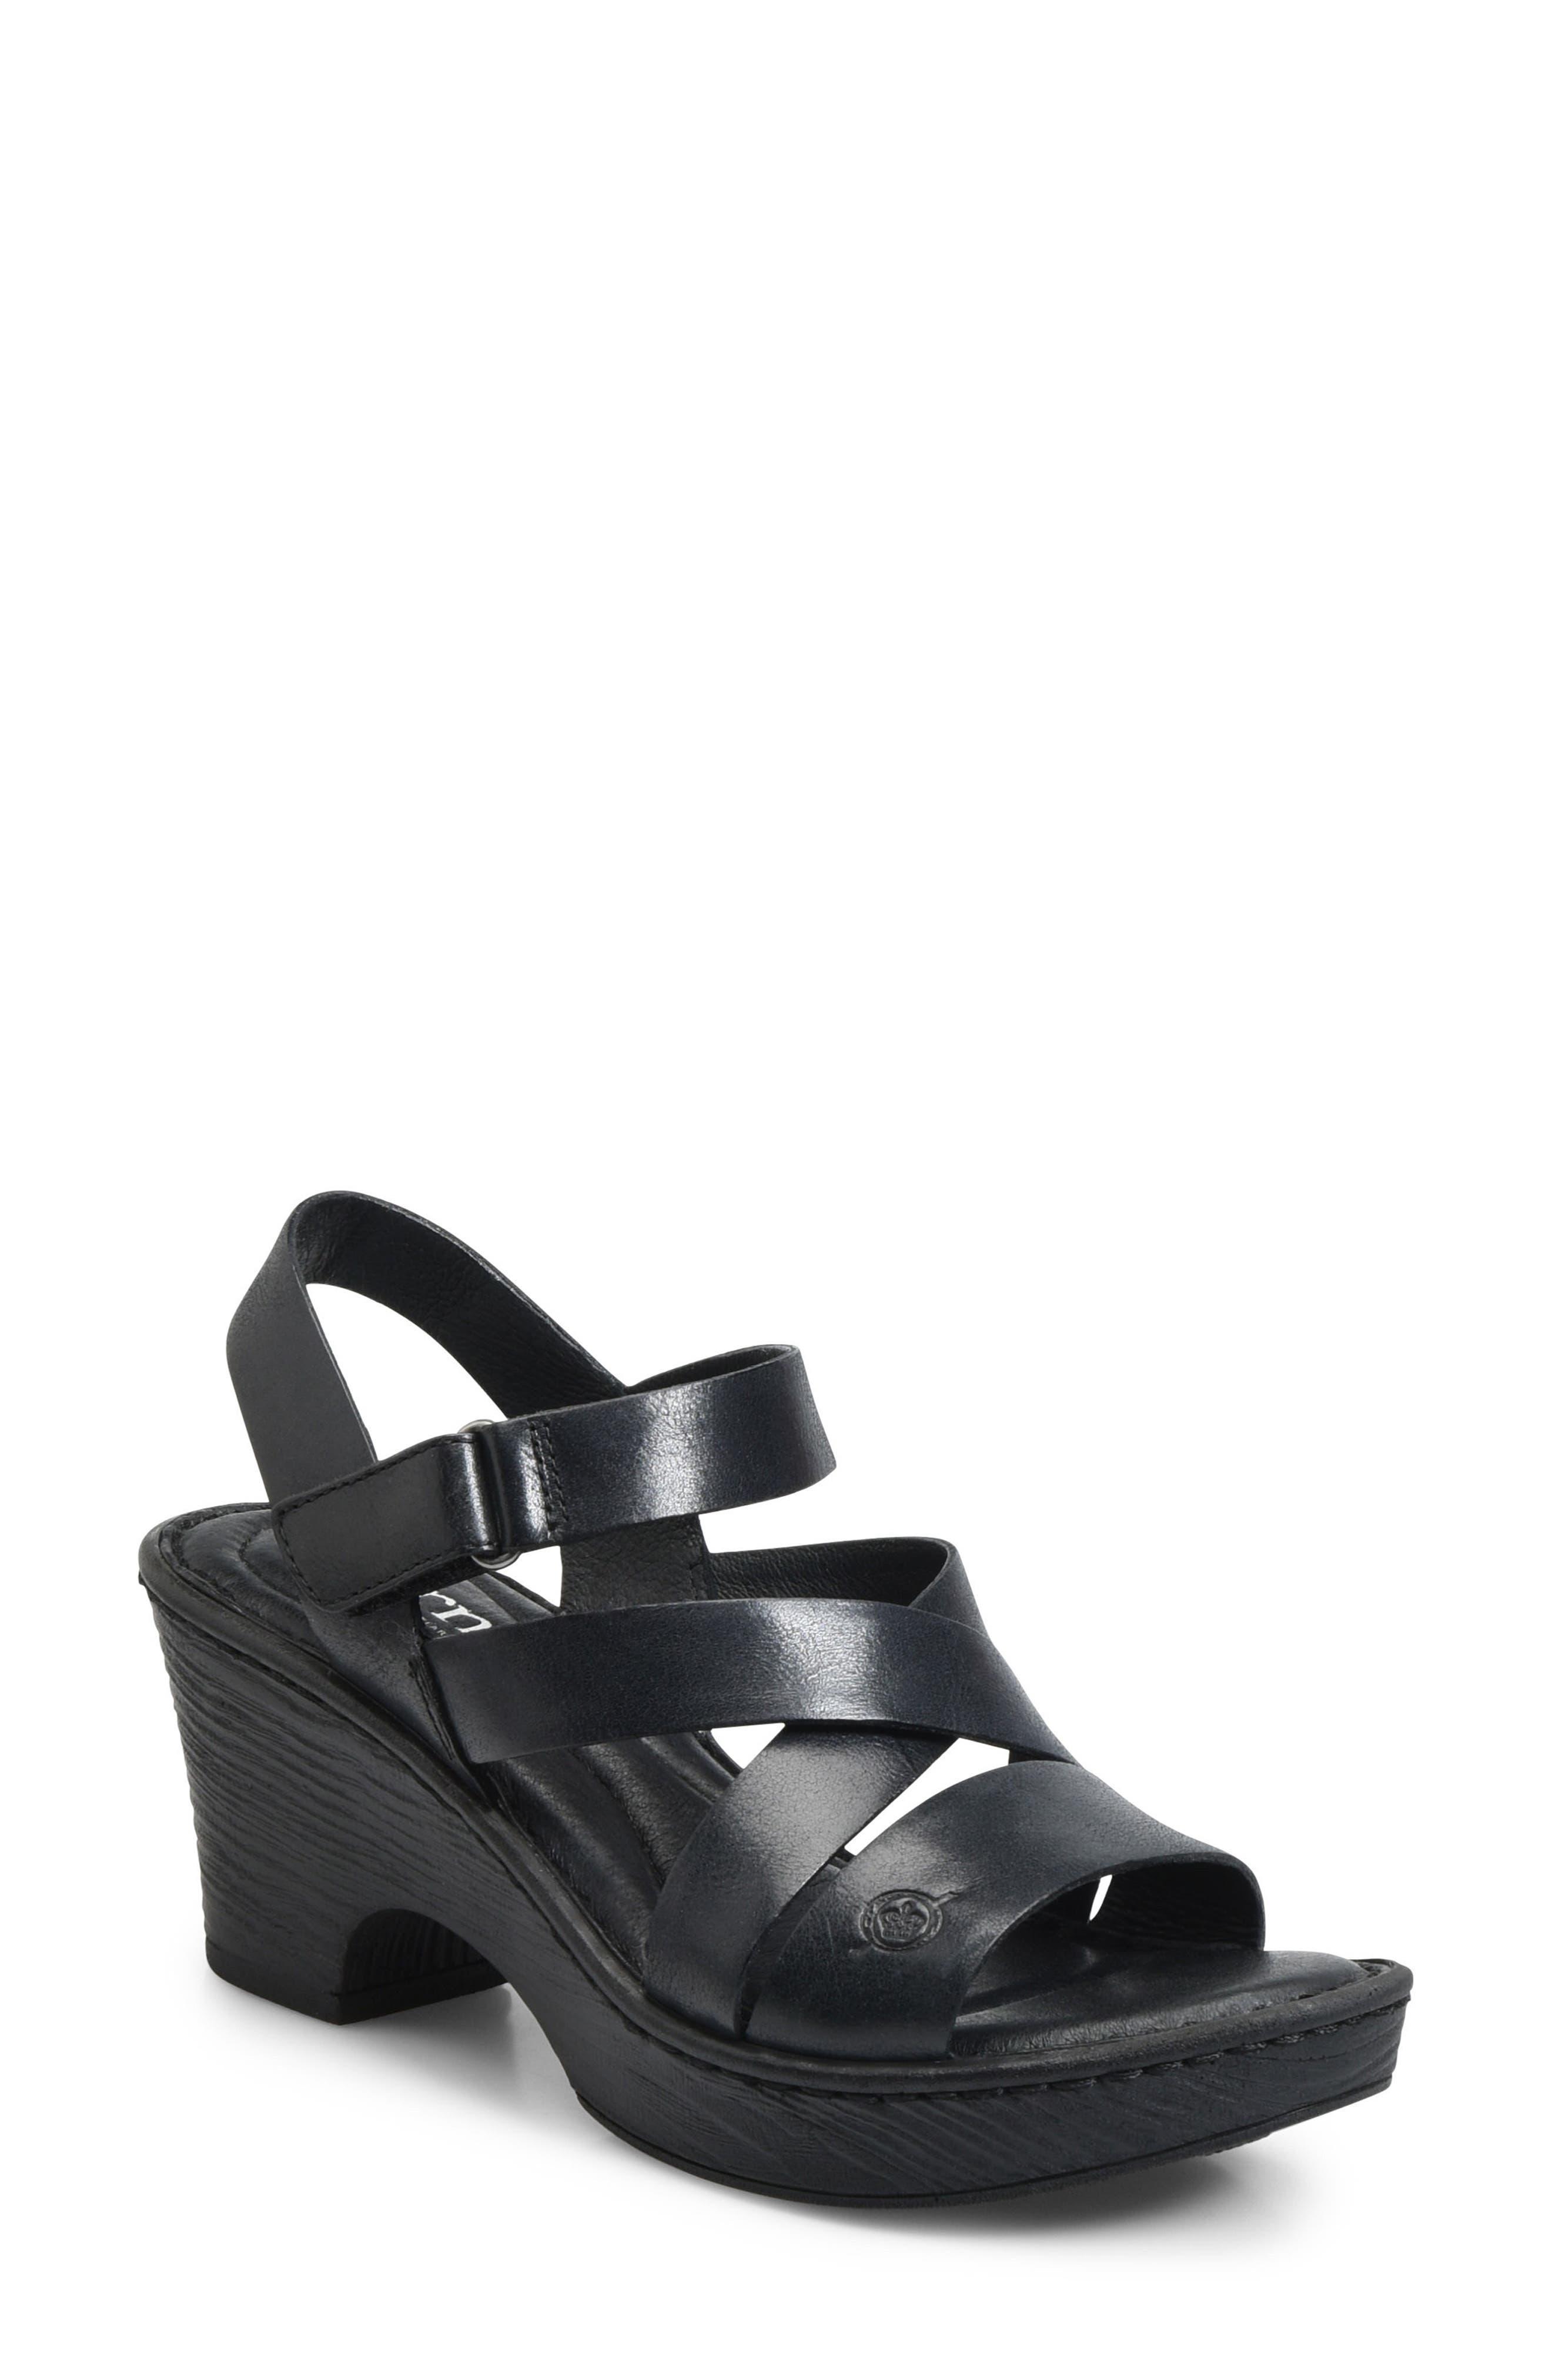 Cubera Platform Sandal,                             Main thumbnail 1, color,                             001